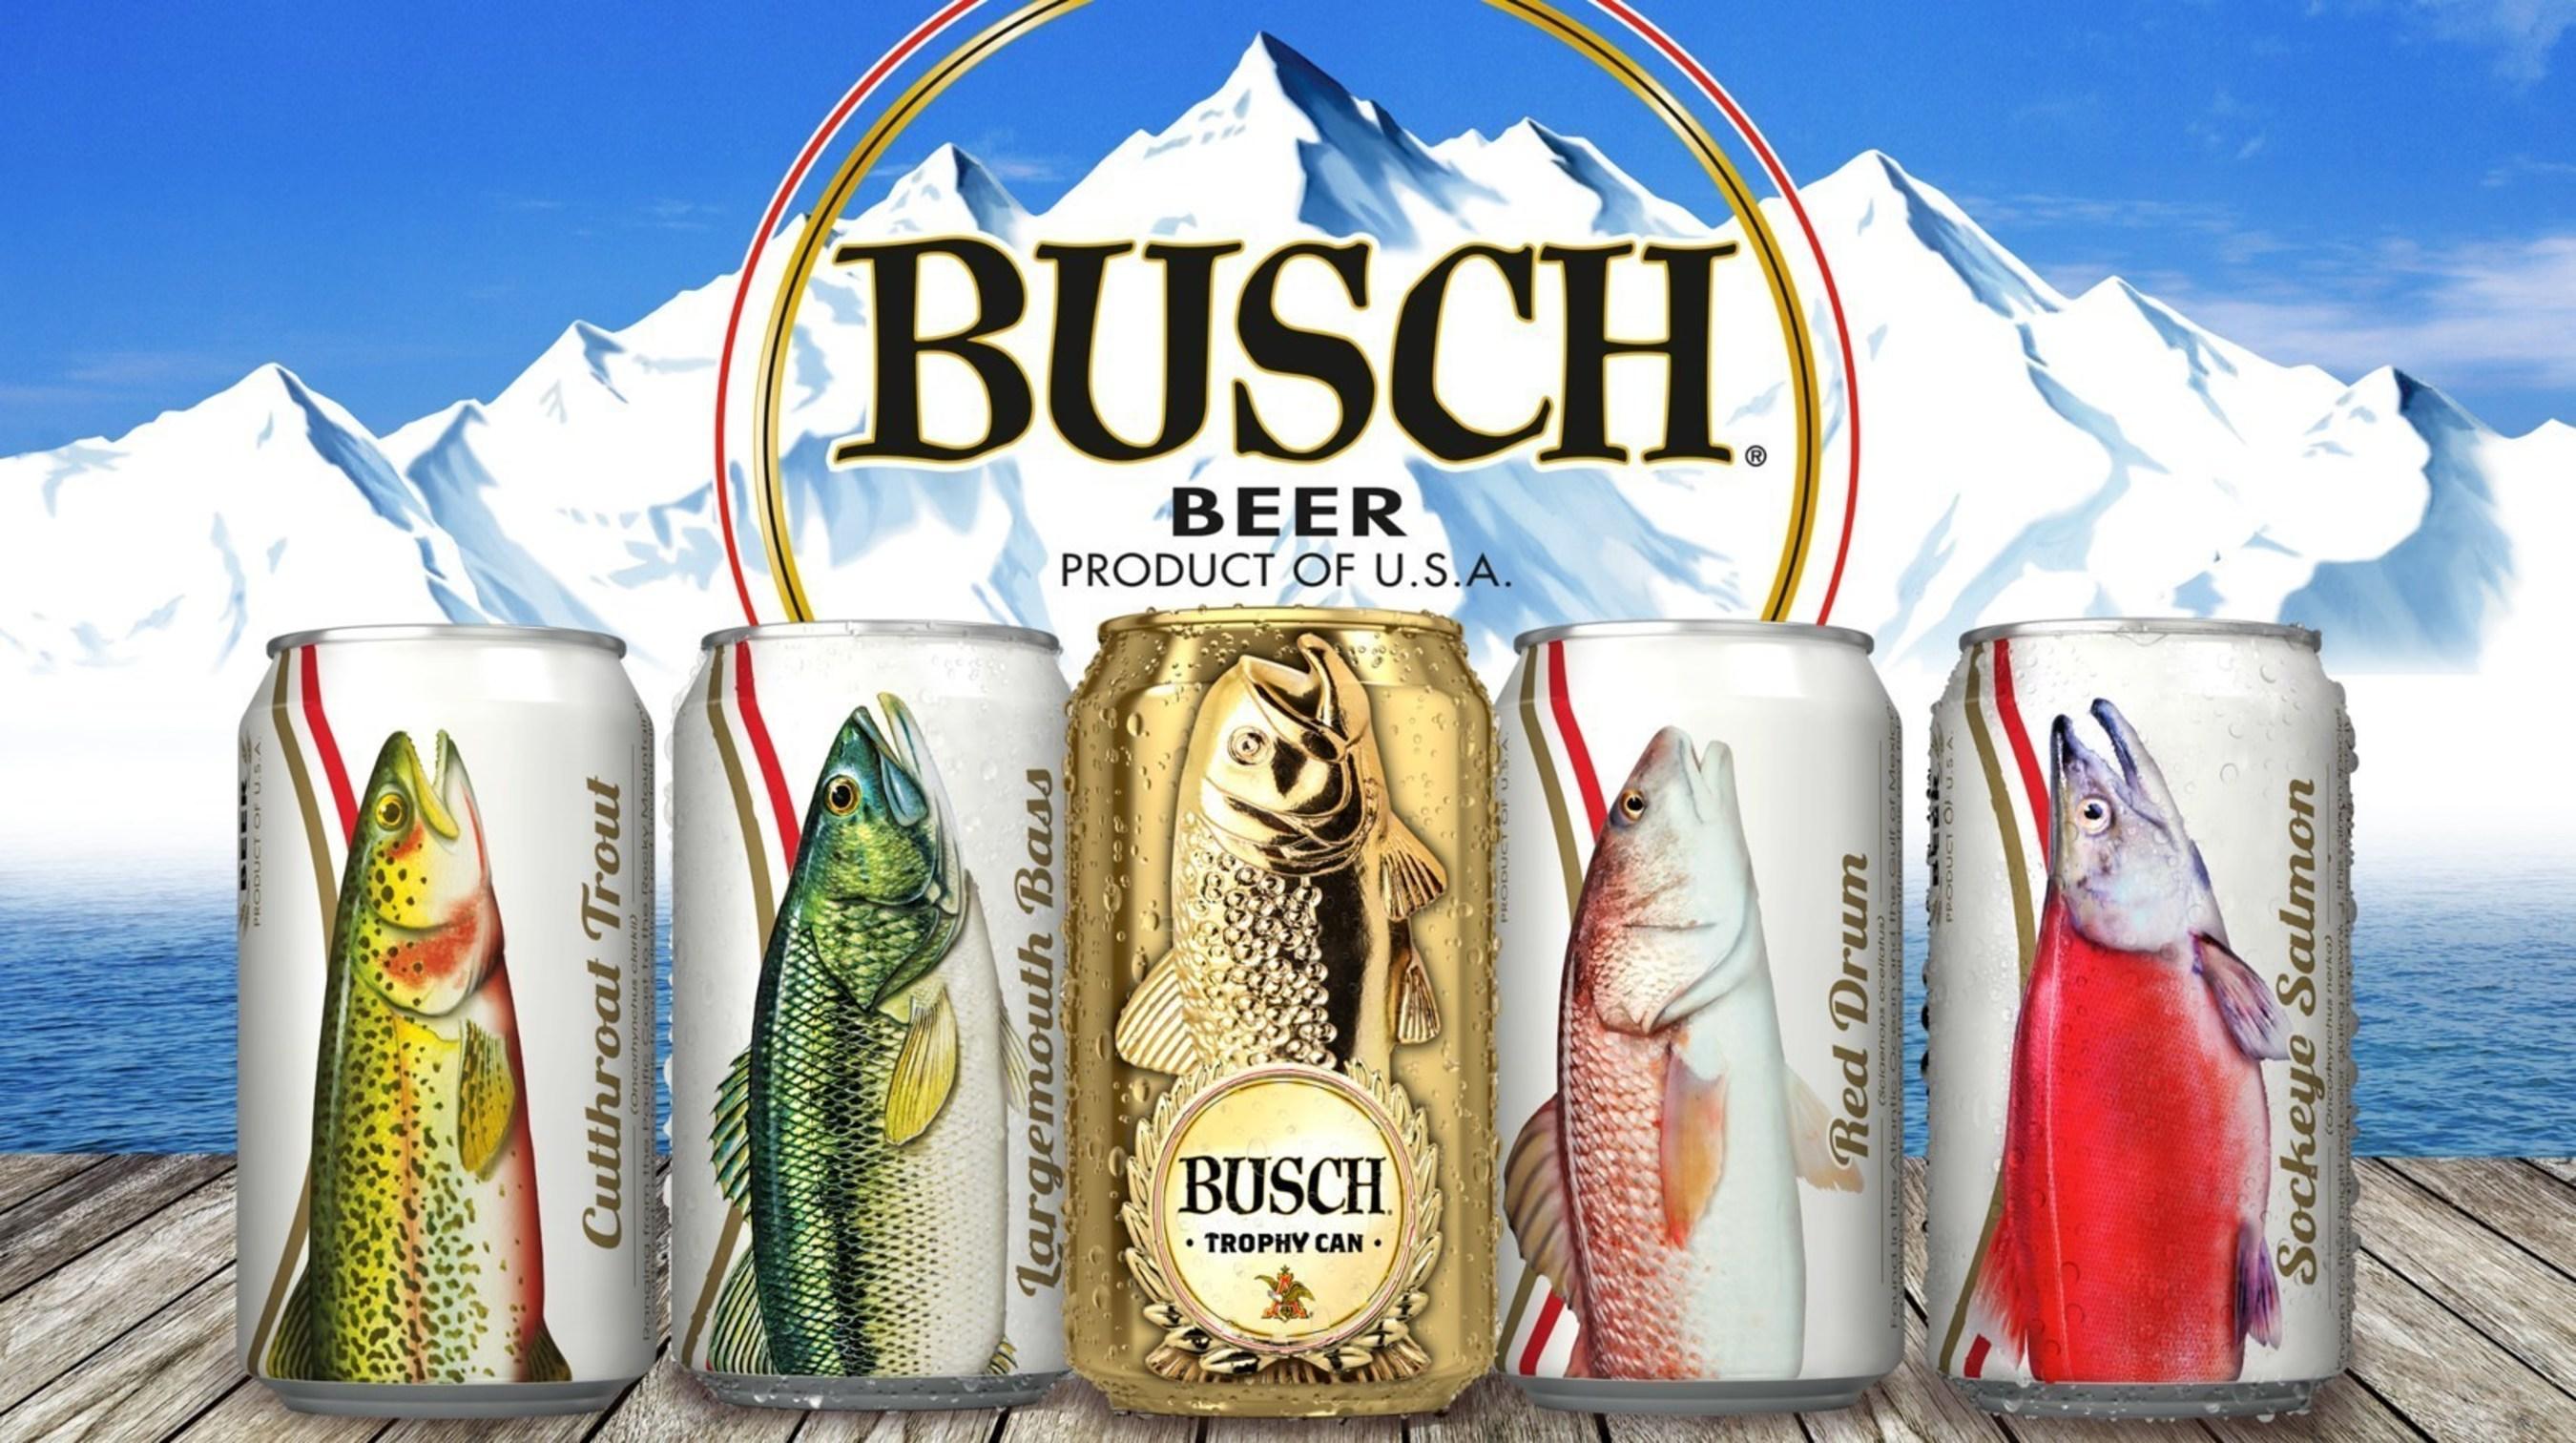 Busch Beer's